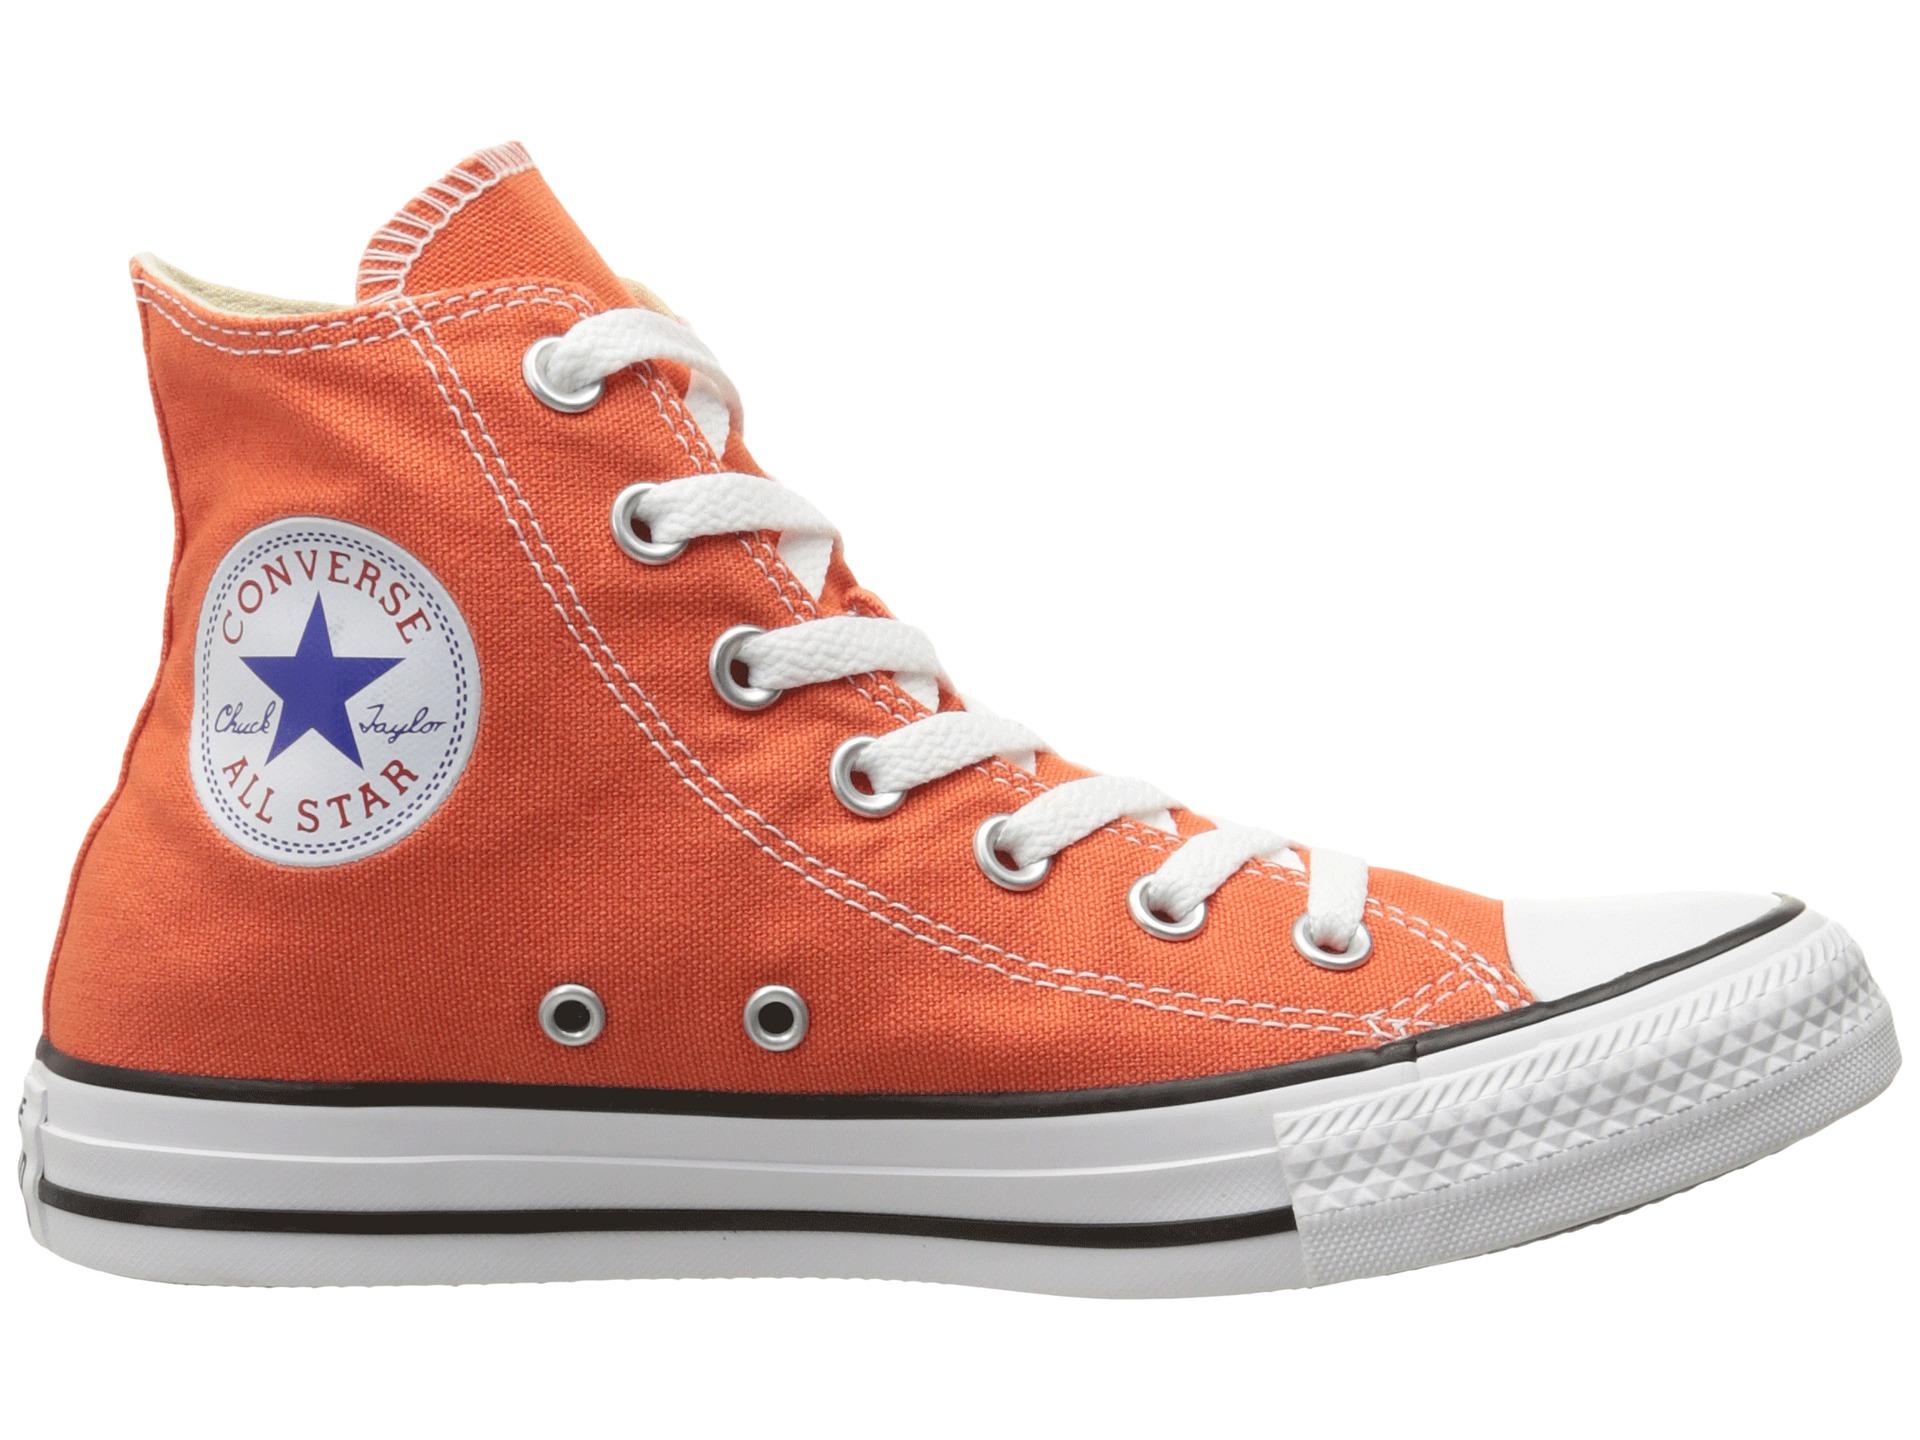 All Color Vans: Converse Chuck Taylor® All Star® Seasonal Color Hi In